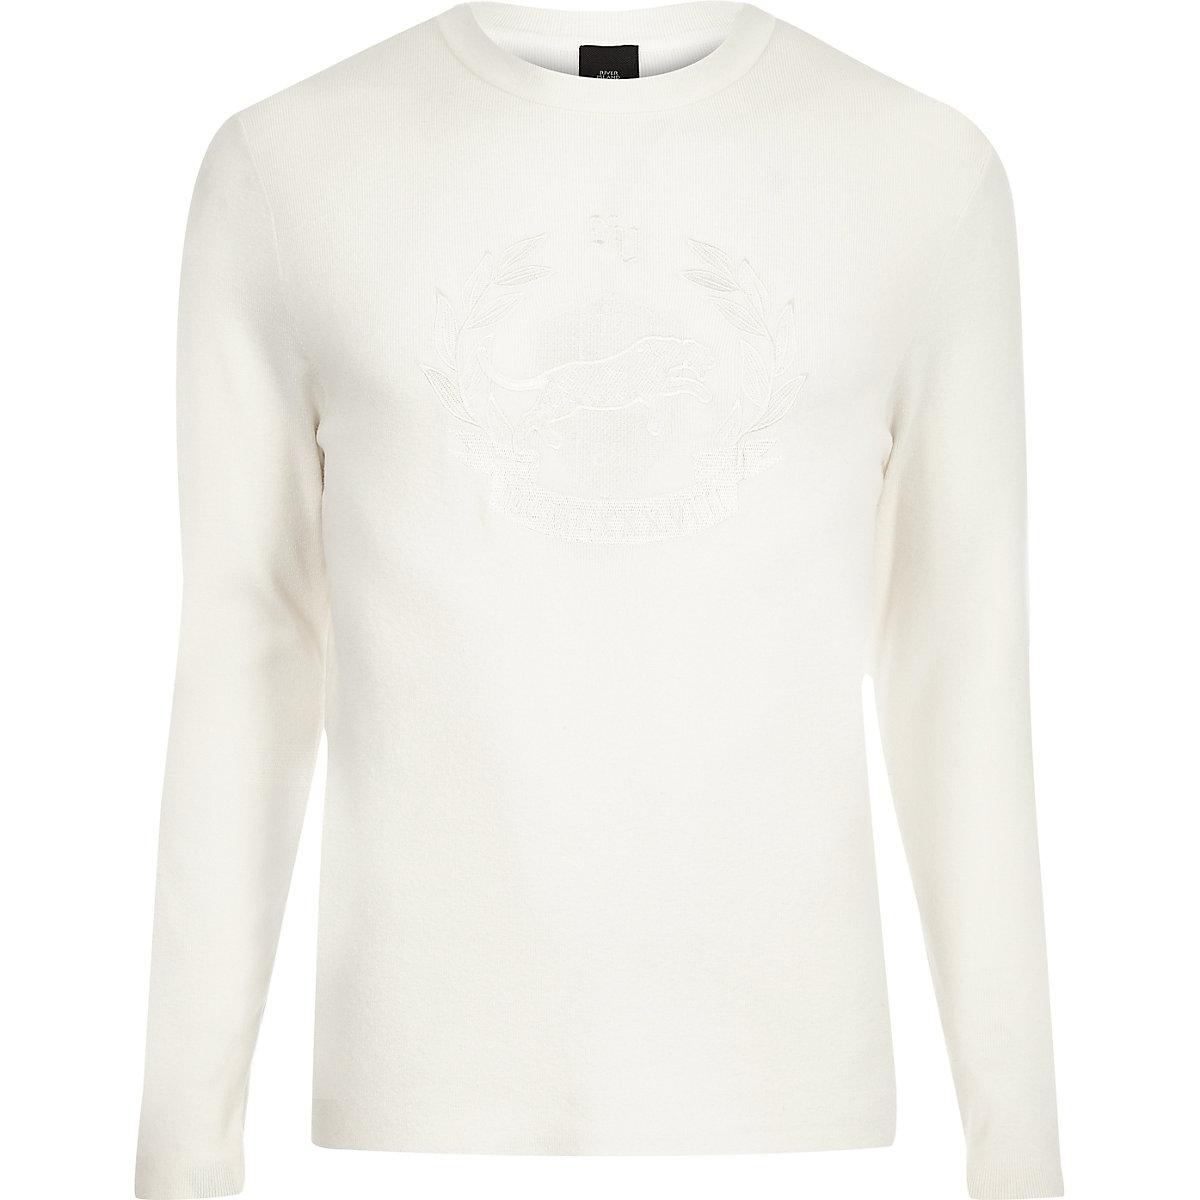 Ecru embroidered slim fit long sleeve jumper